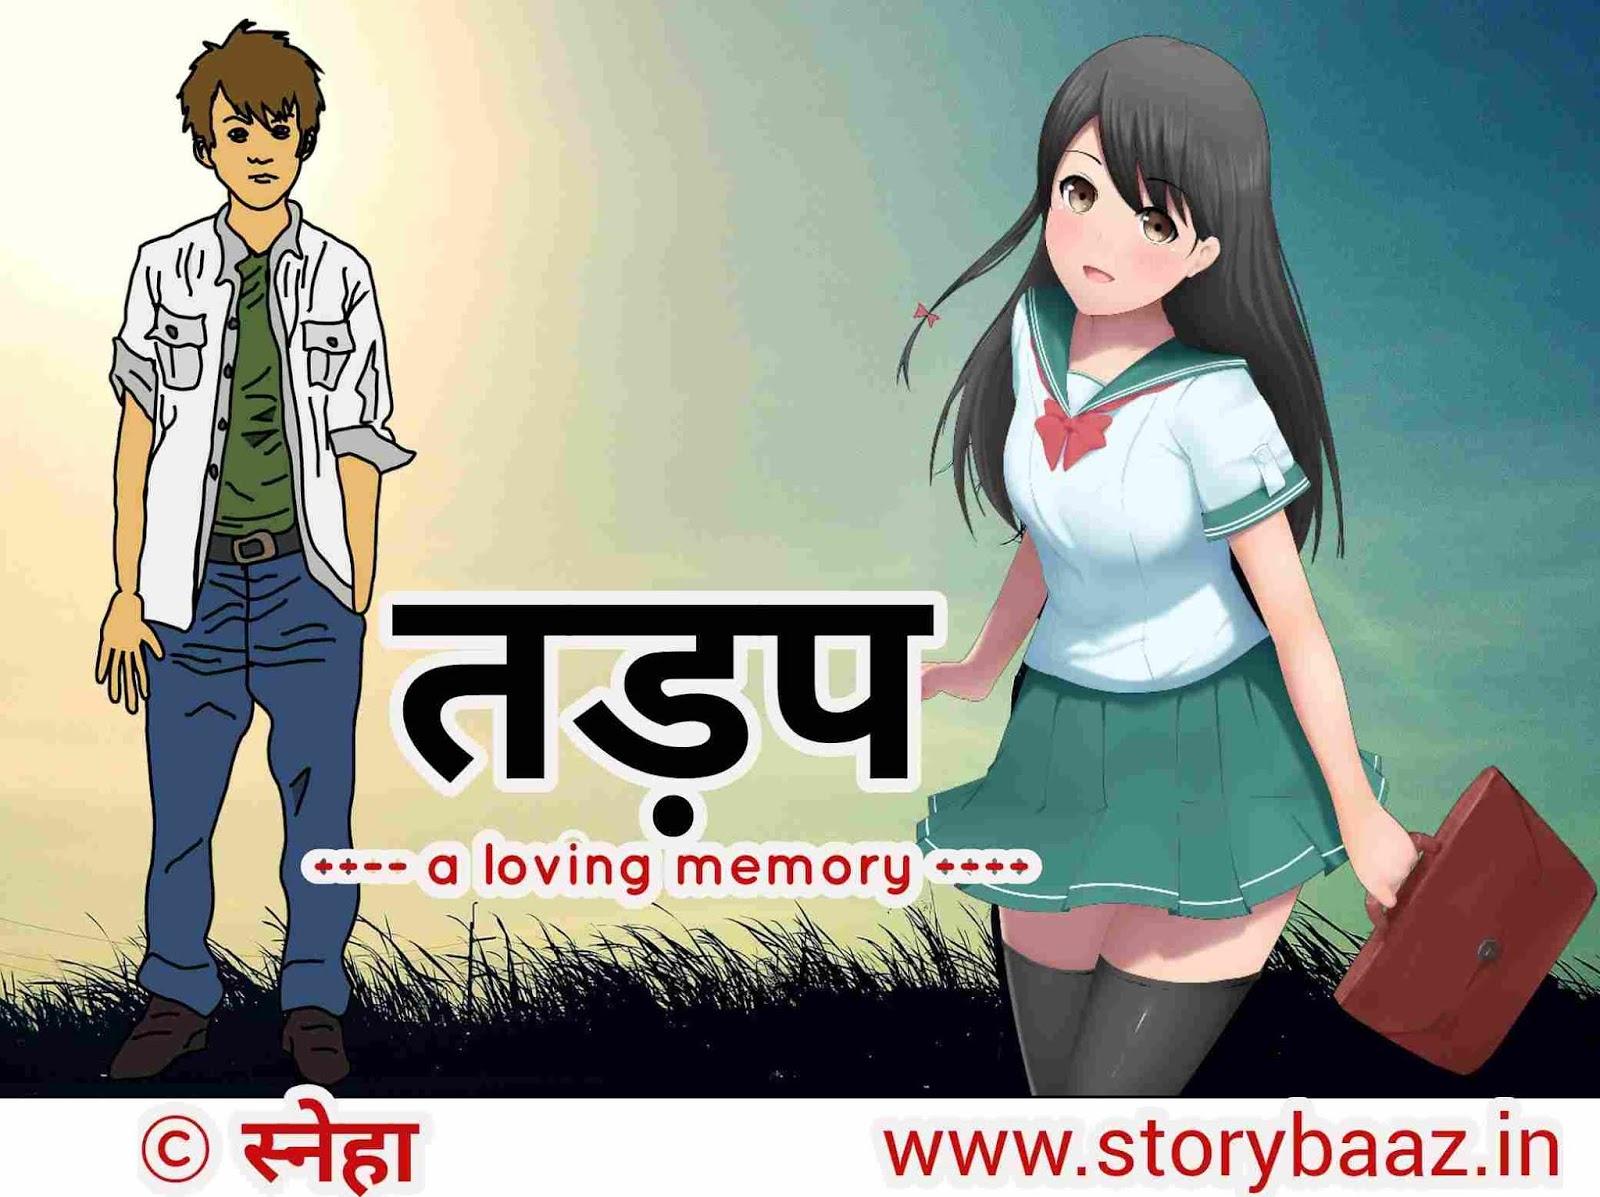 tadap-hindi-love-story-school-love-stories-hindi-mein-hd-images-sneha